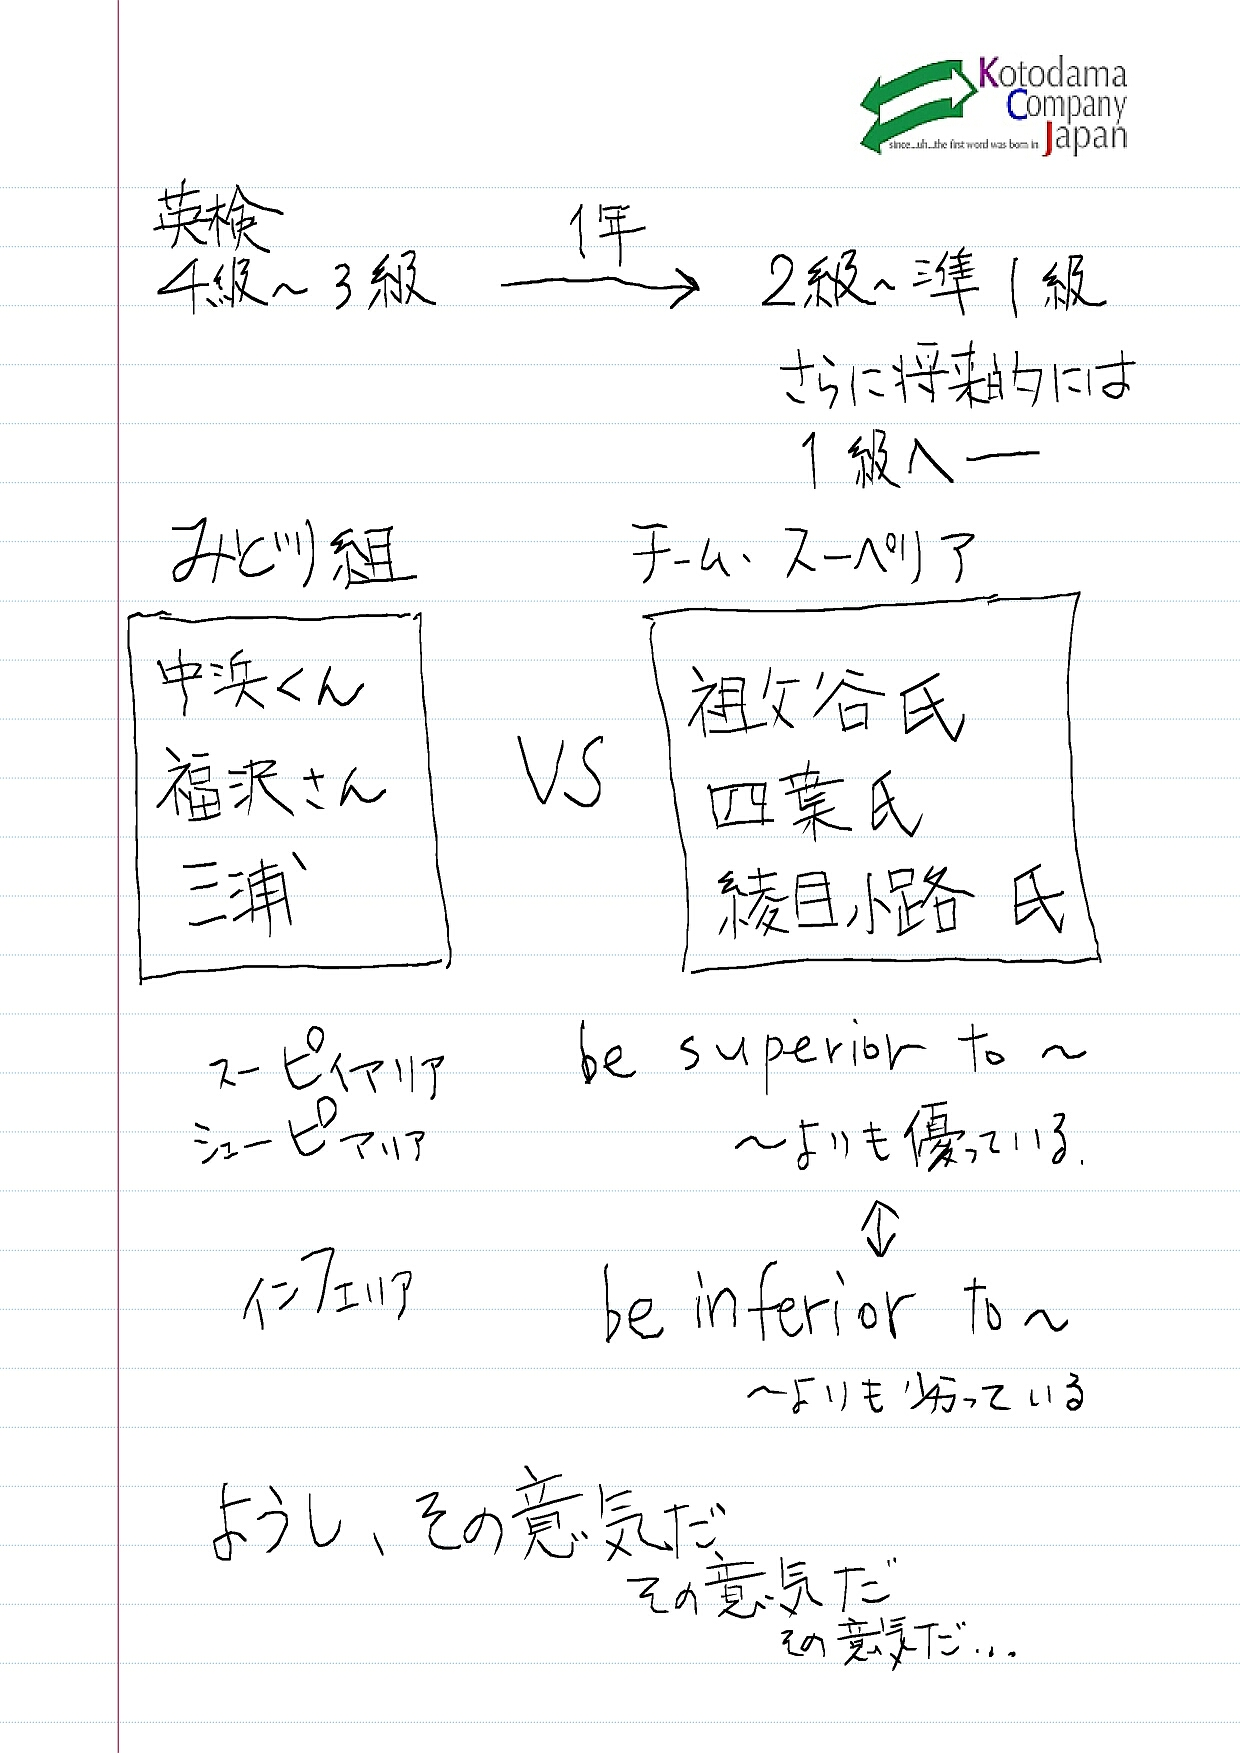 00-06ノート:三浦杏児.jpg